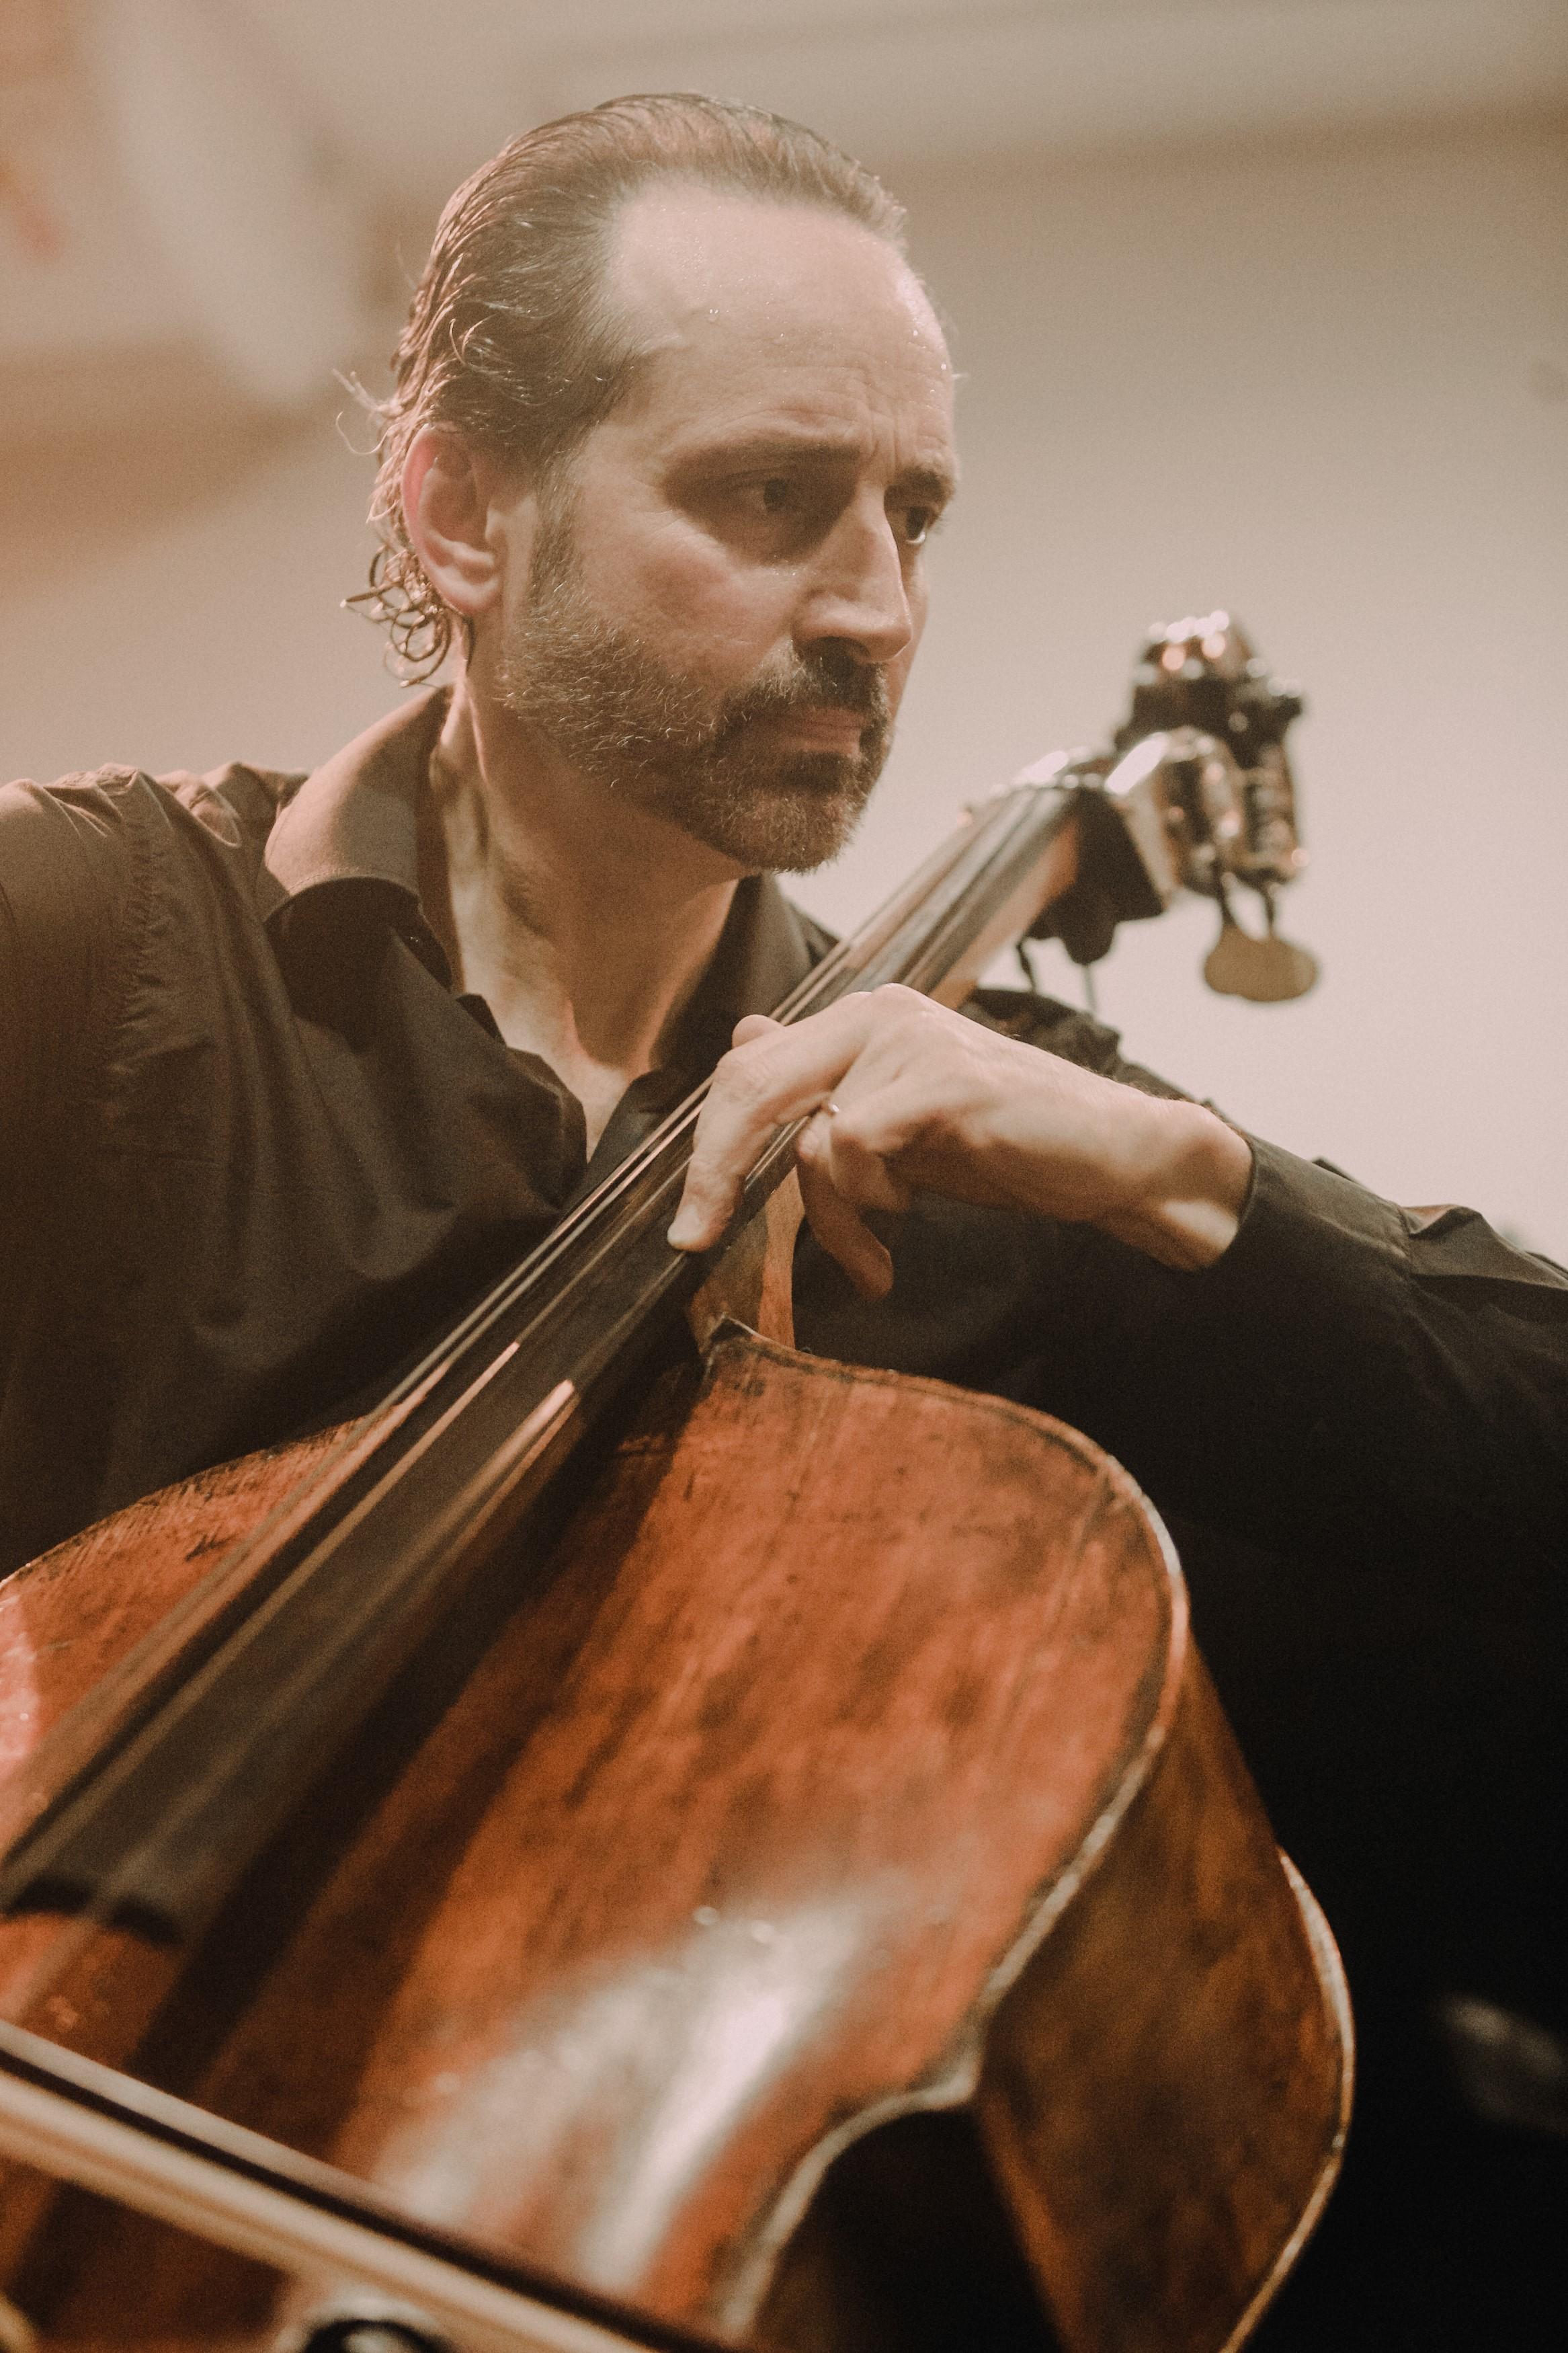 Marcos Machado